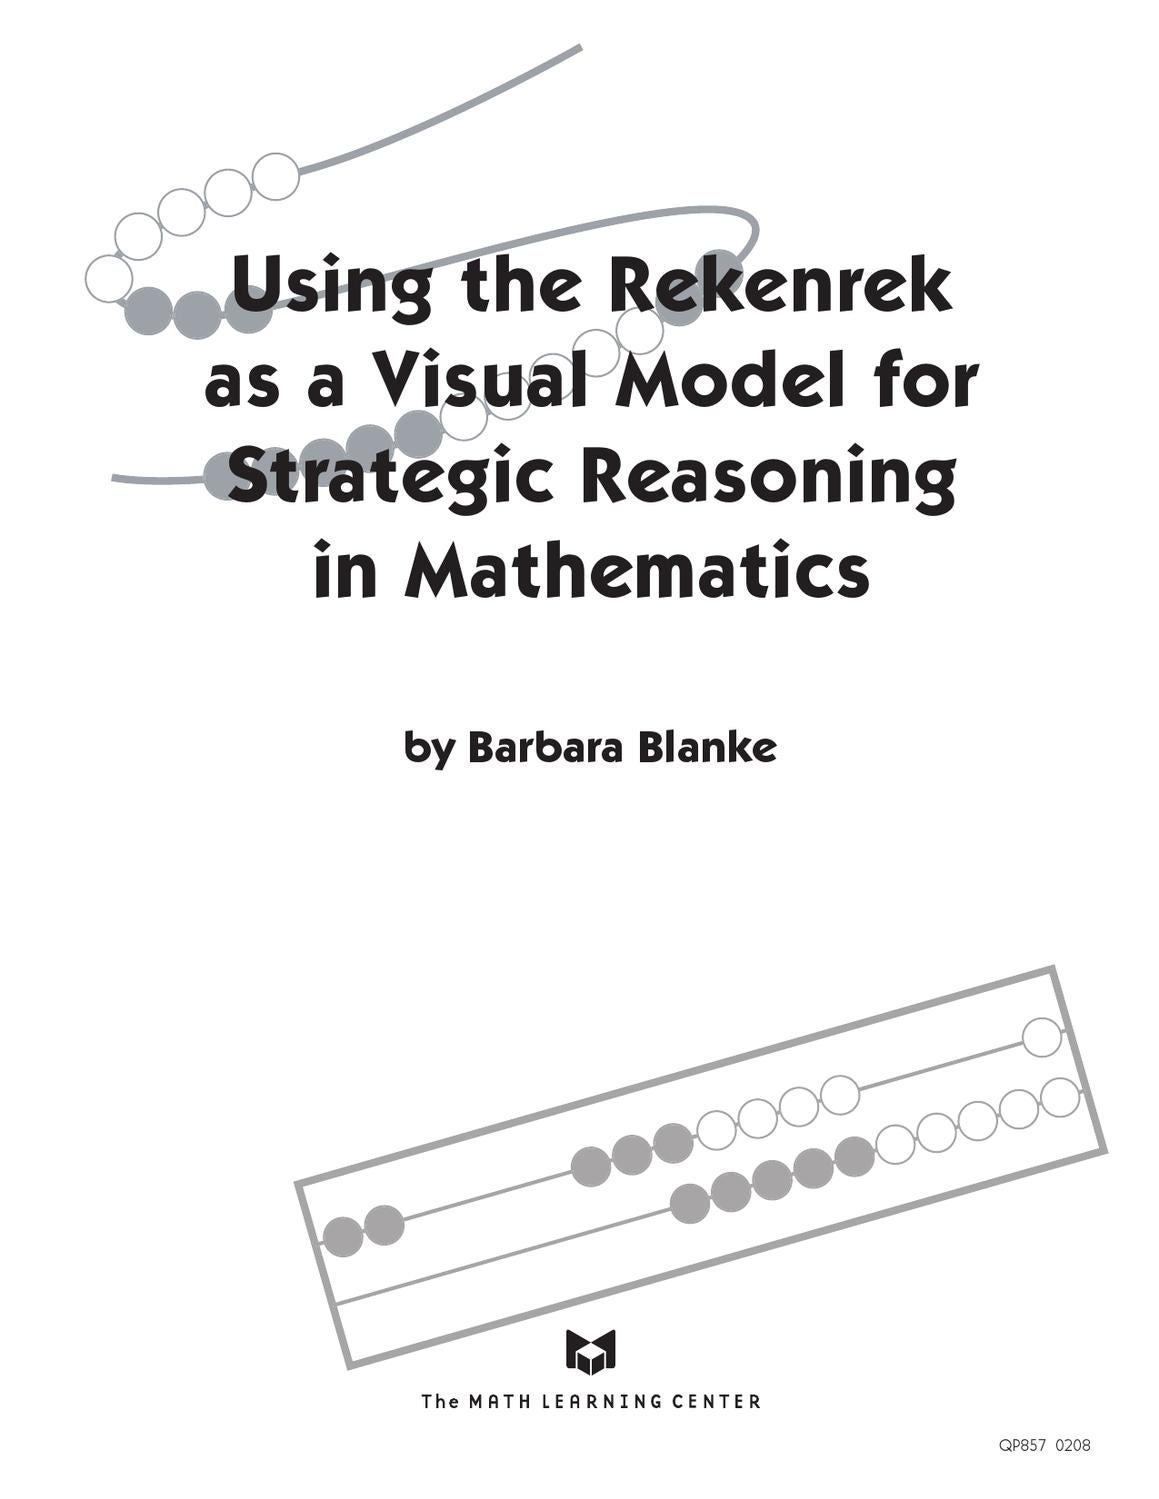 Using the Rekenrek as a Visual Model for Strategic